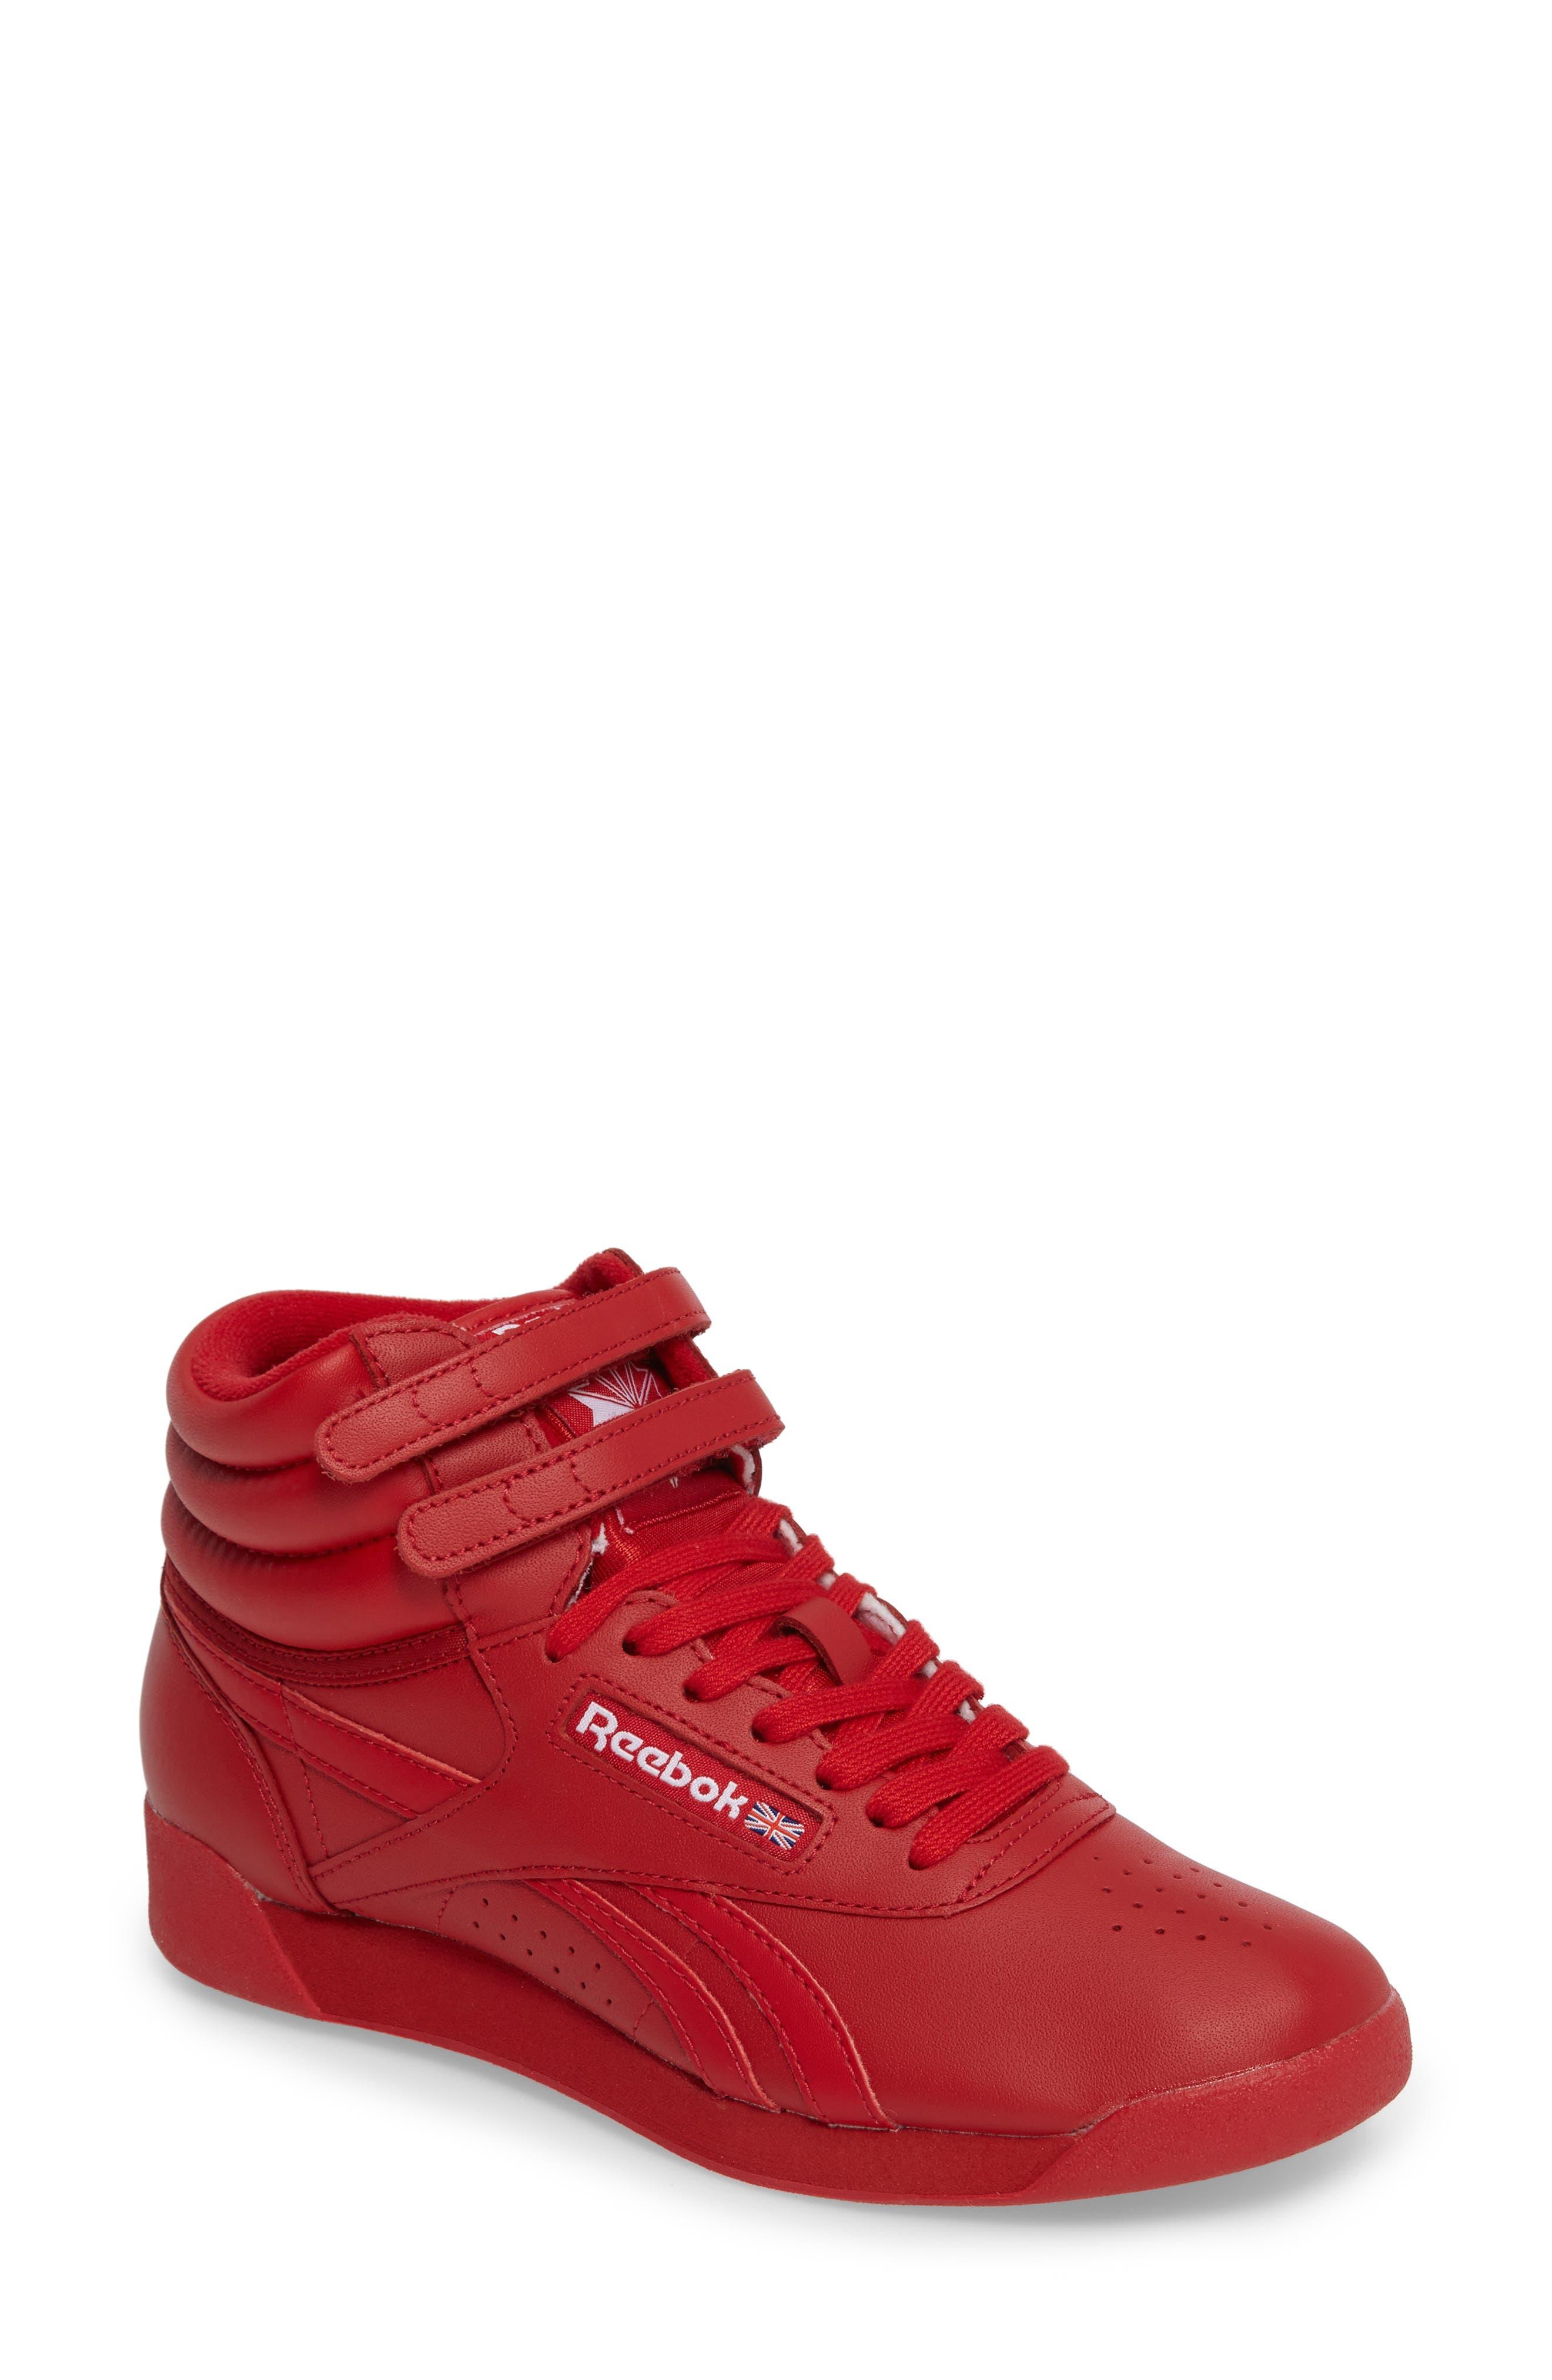 Freestyle Hi Sneaker,                         Main,                         color,